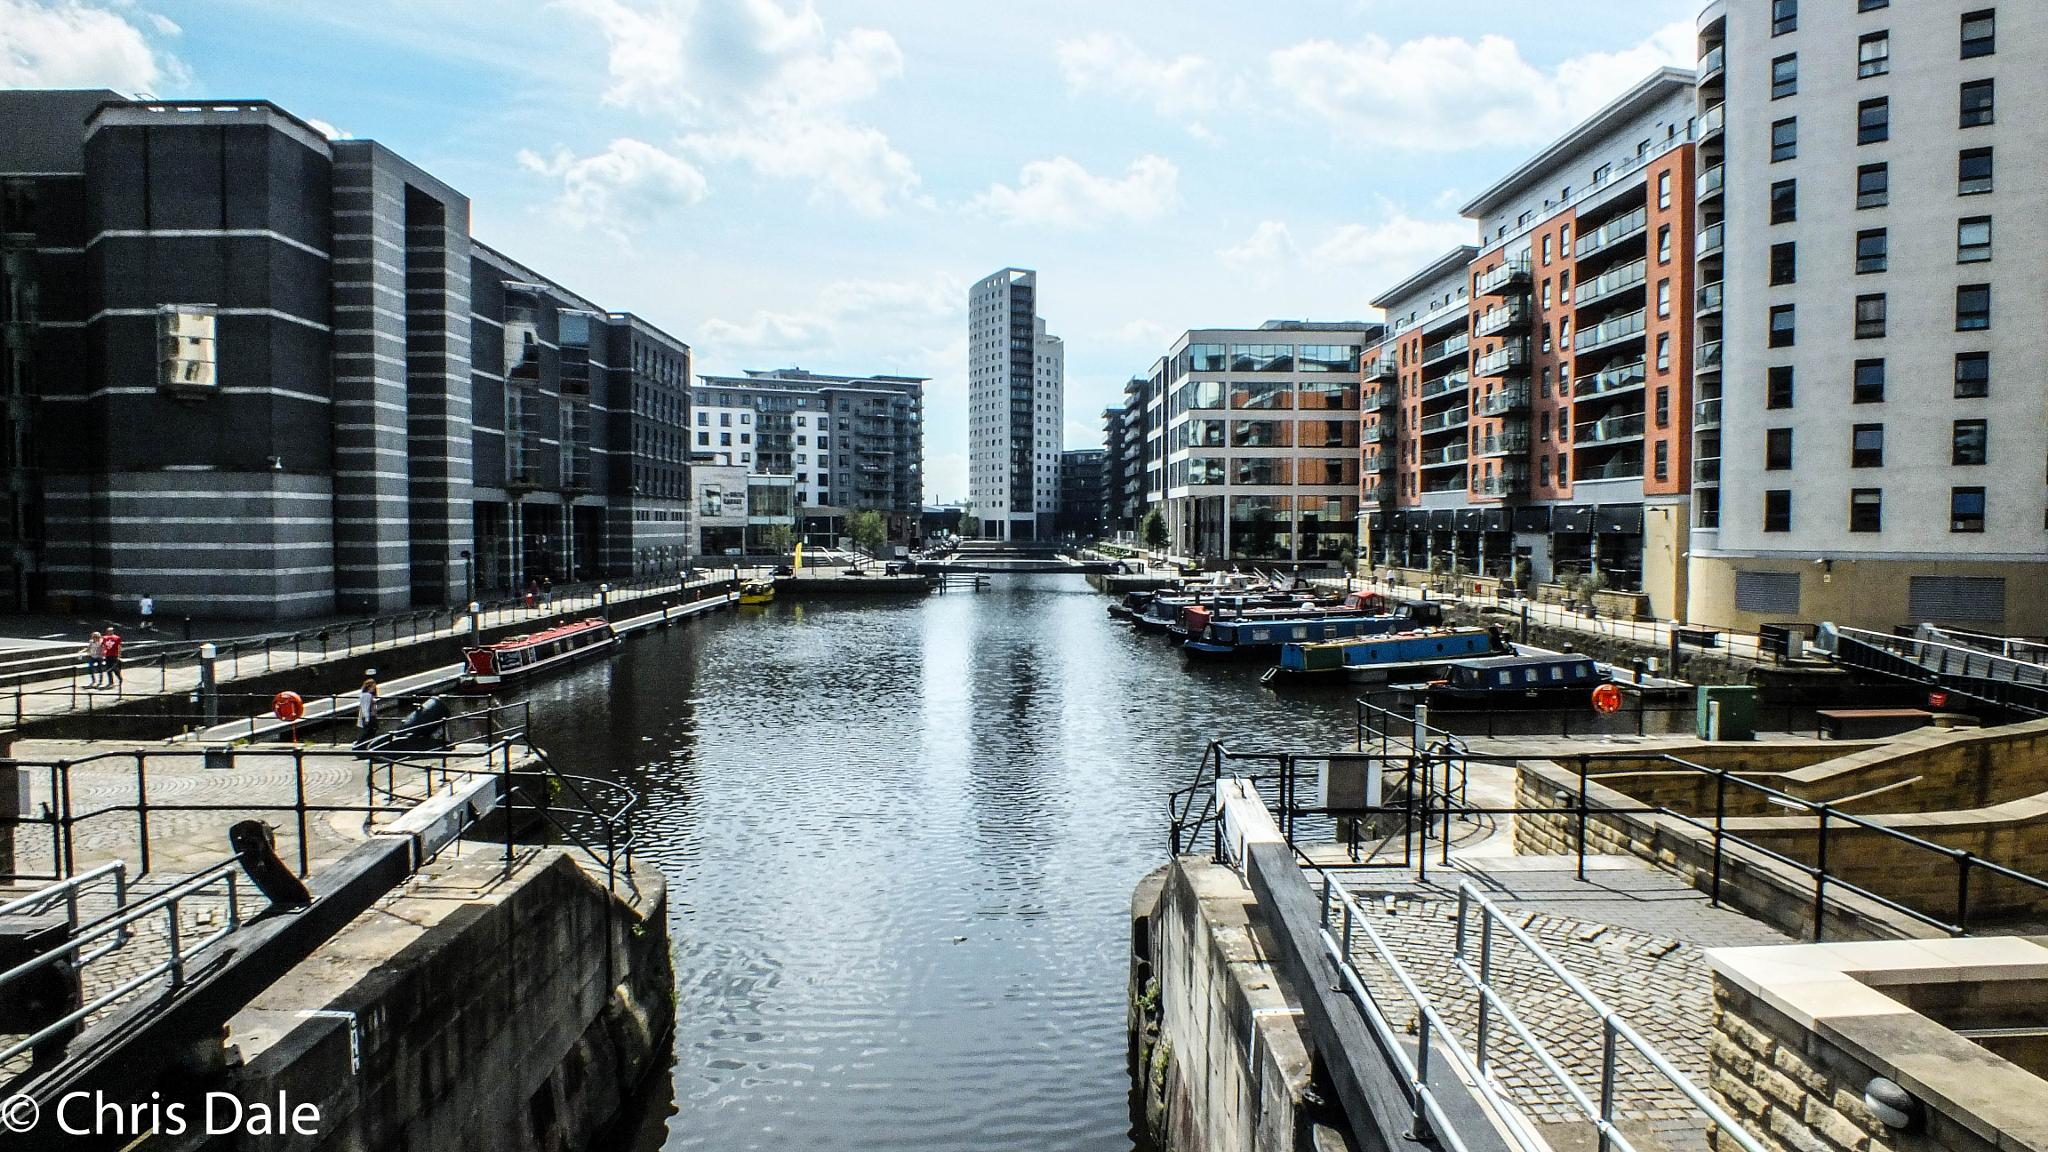 Beautiful Leeds Dock by Chris Dale